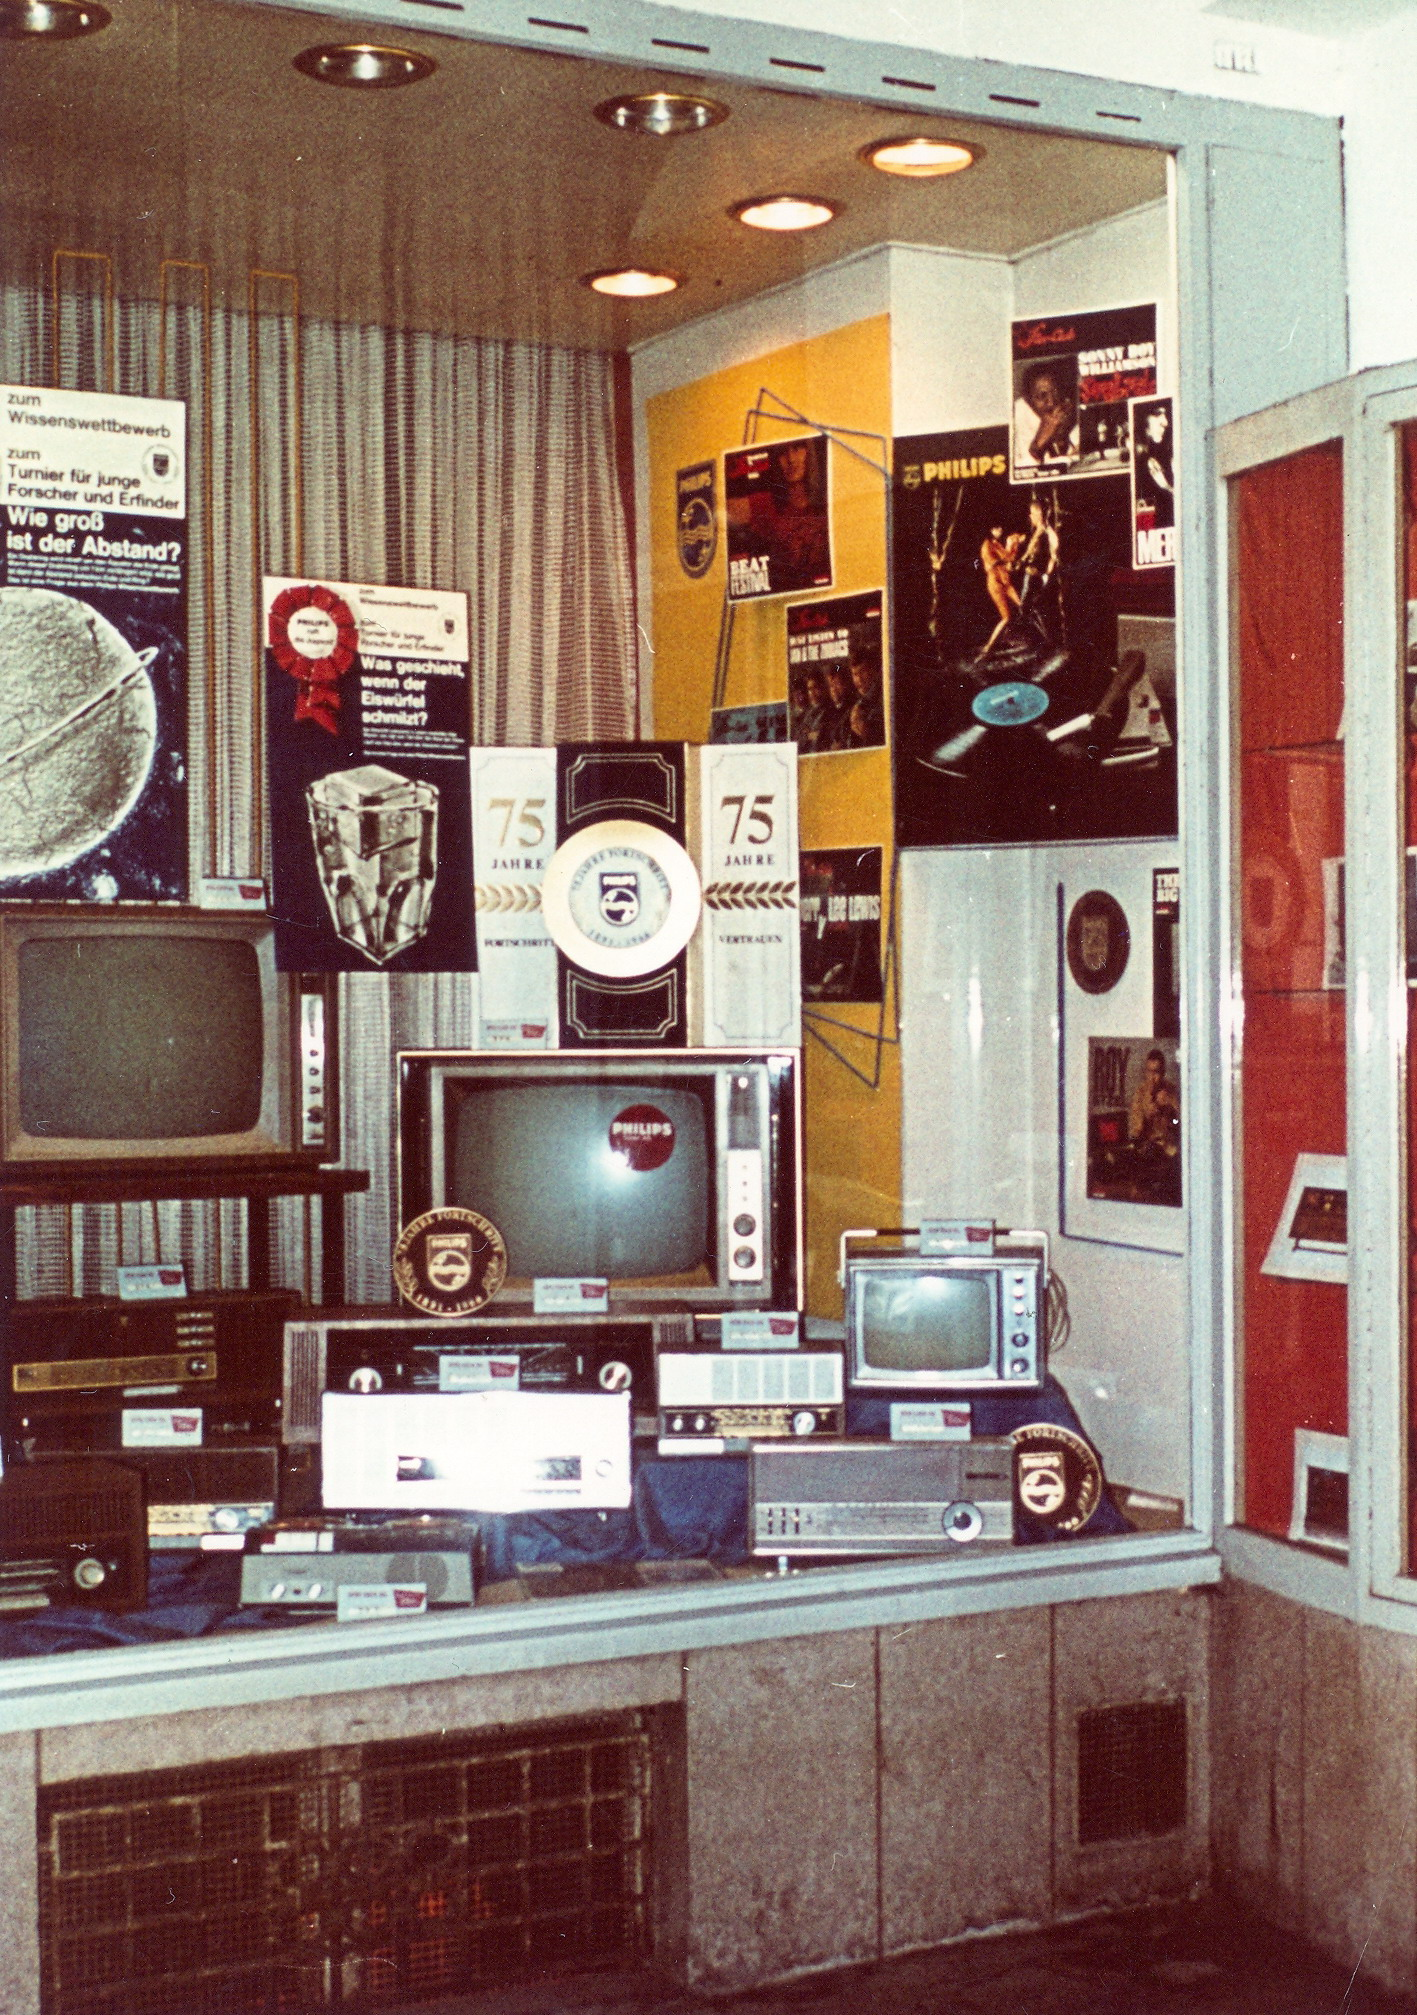 75 Jahre Philips - 1966